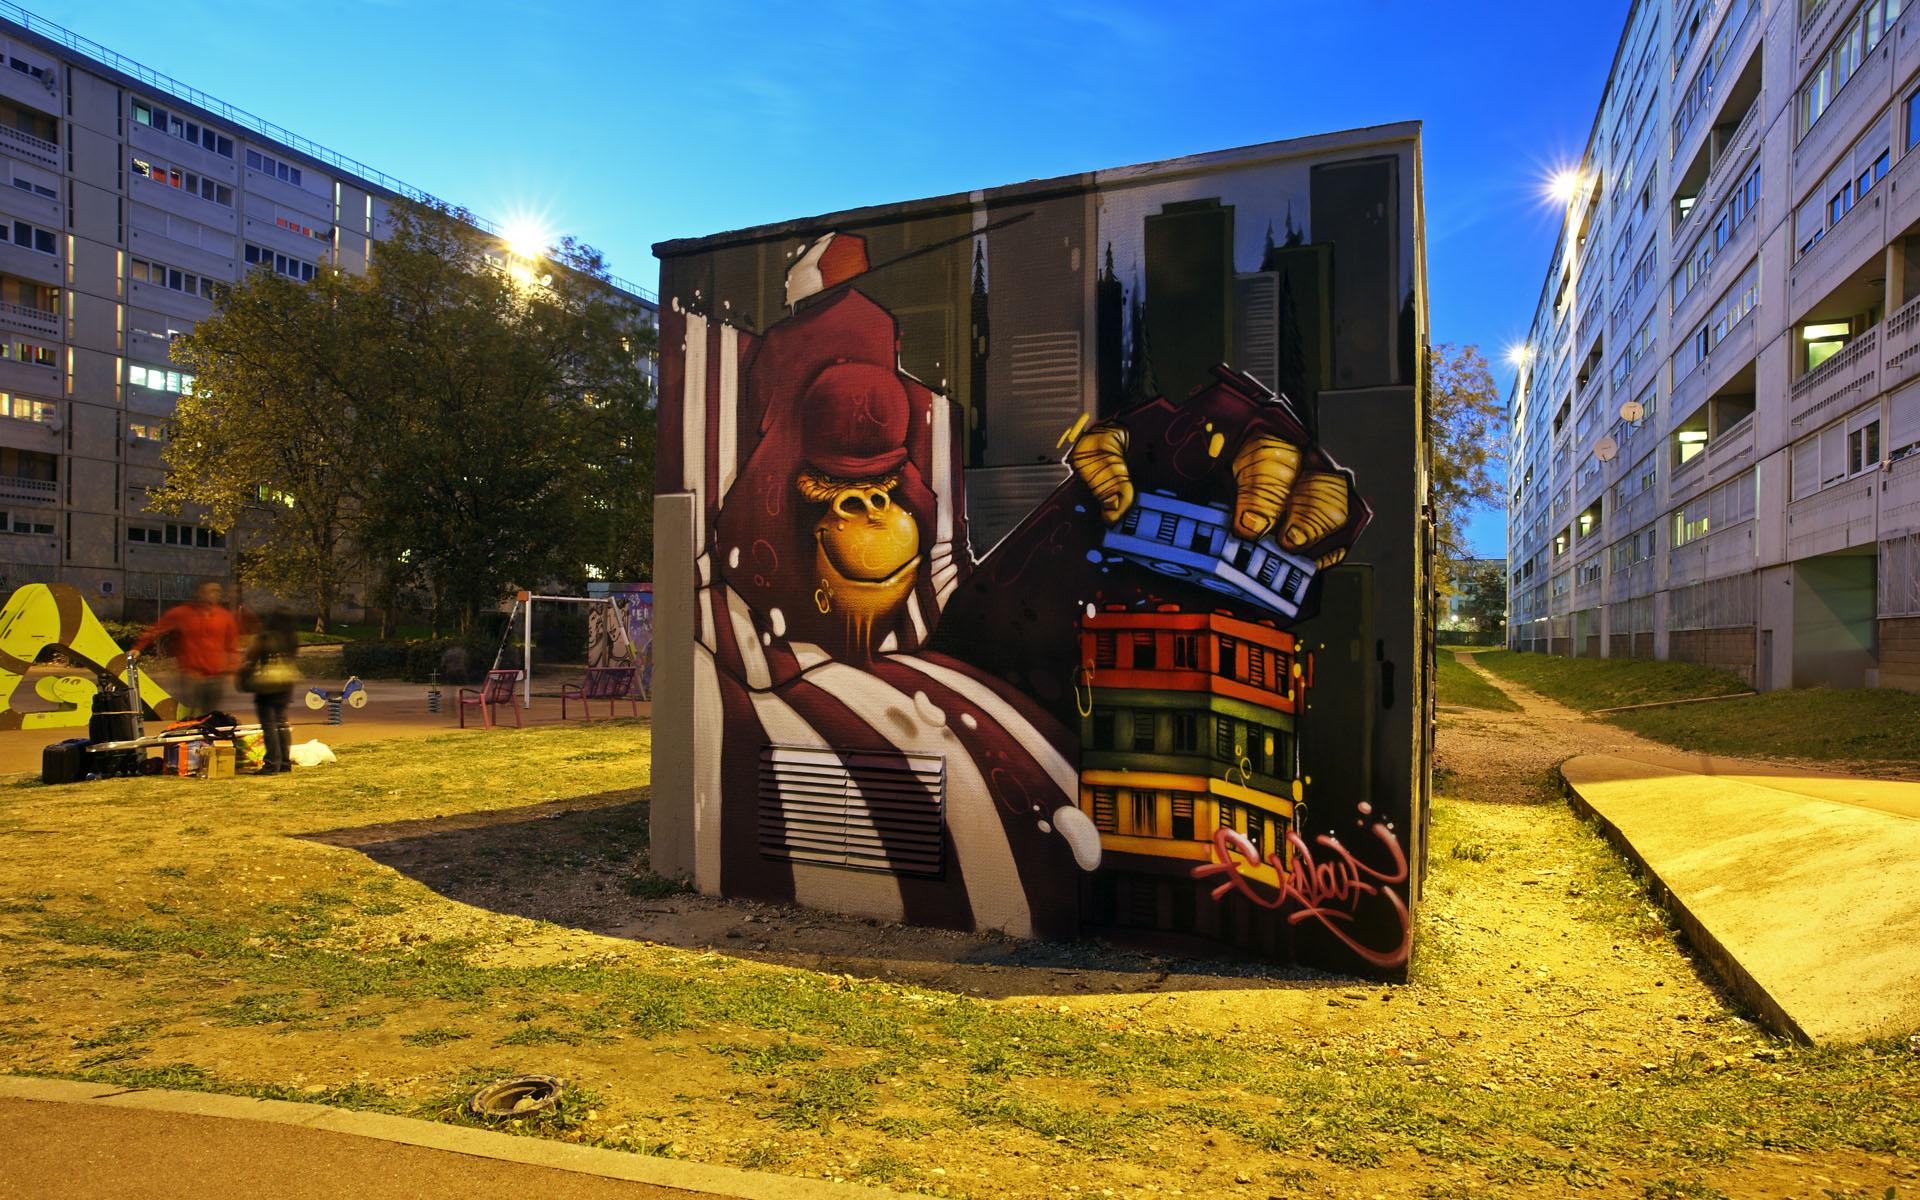 Graff-ik-Art-2015-1